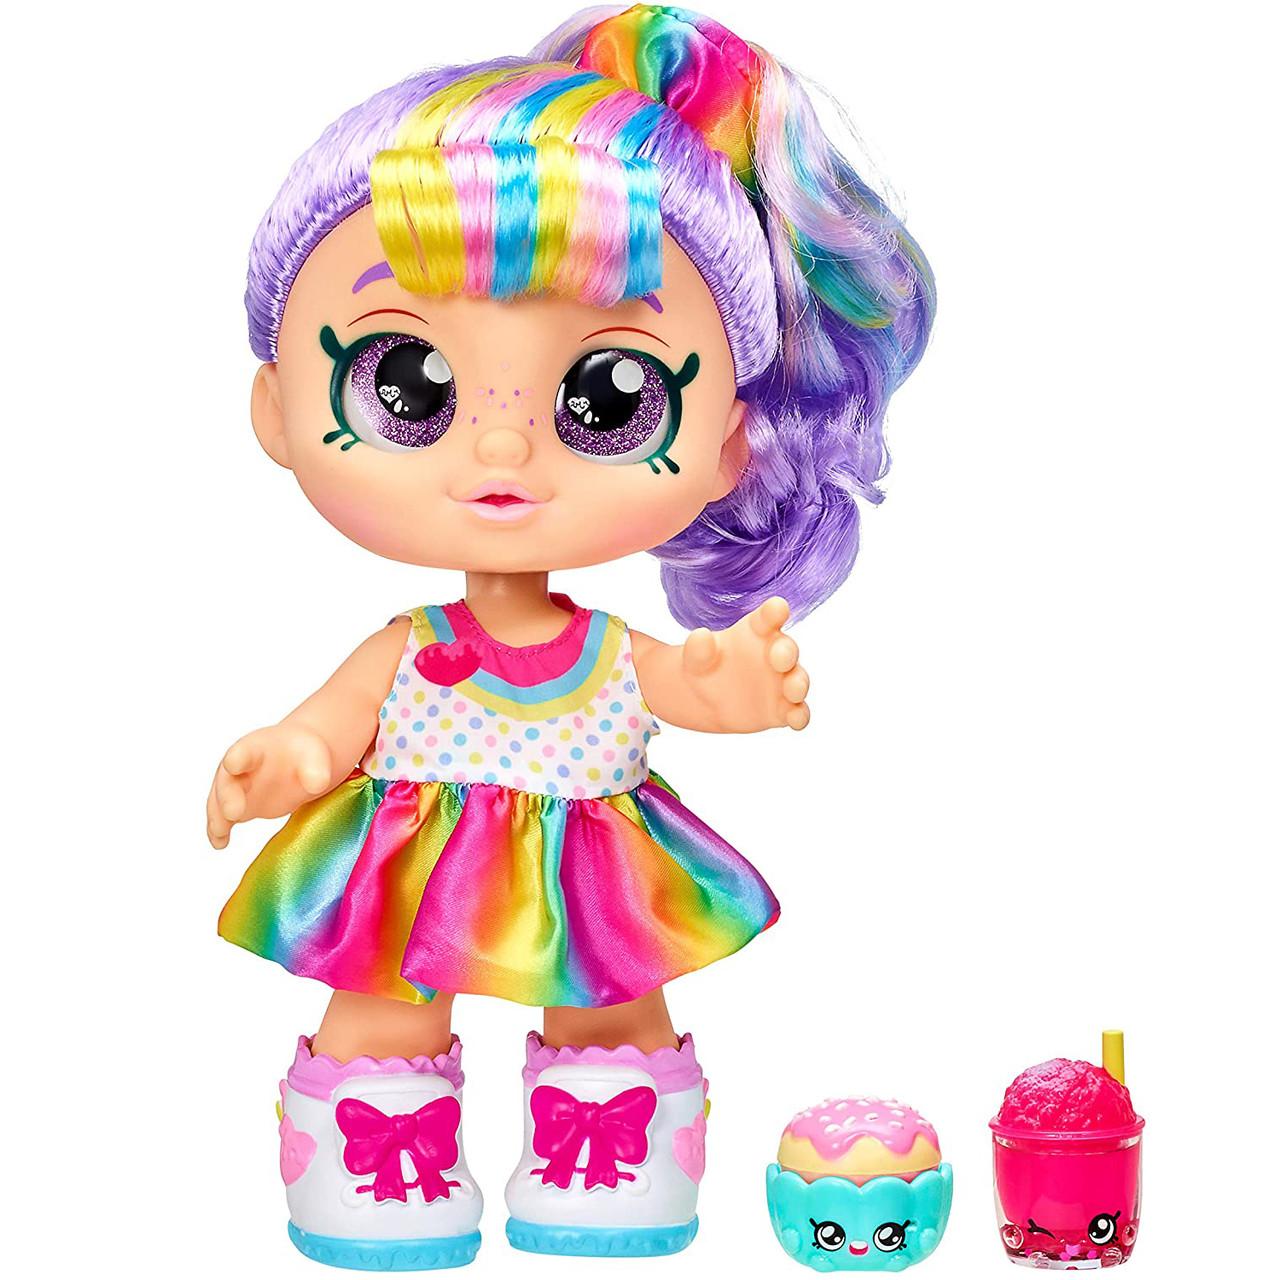 Кукла кинди кидс Радуга Кейт Время друзей  kindi kids  Rainbow Kate